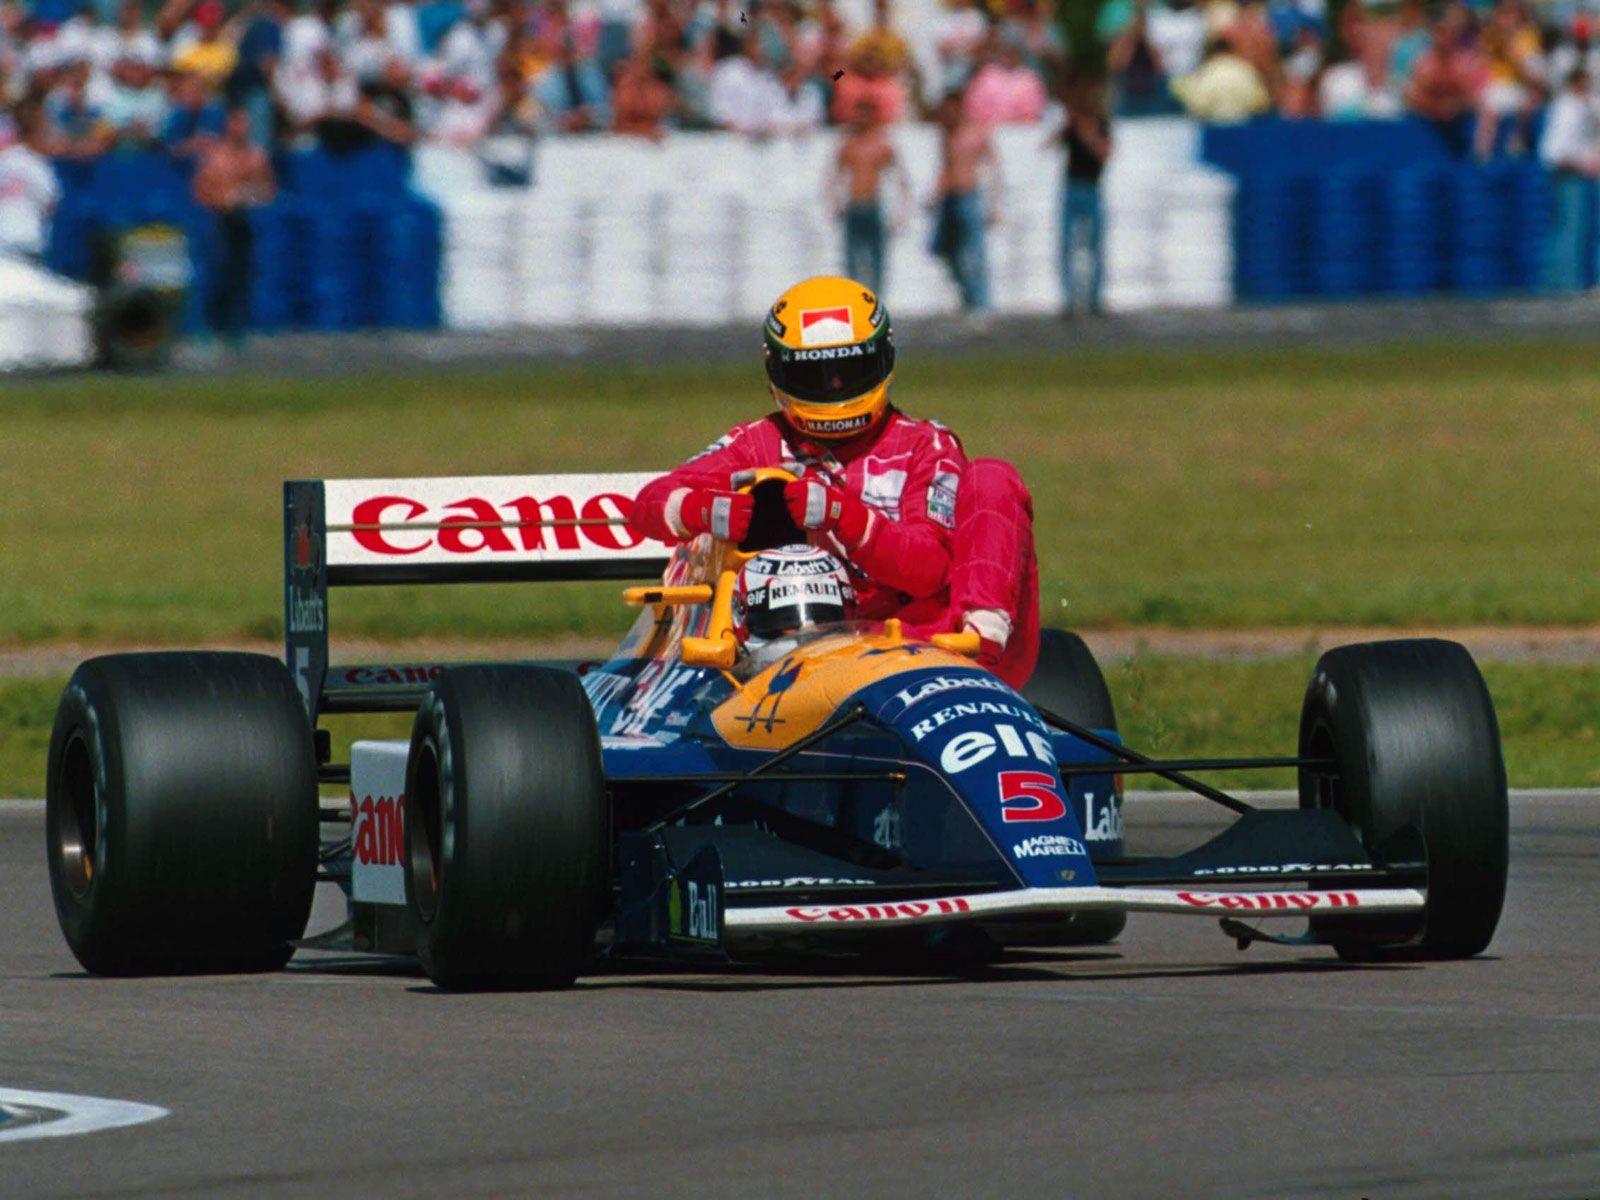 1992 GP Wielkiej Brytanii (Silverstone) Williams FW14B - Renault (Nigel Mansell & Ayrton Senna - pasażer)